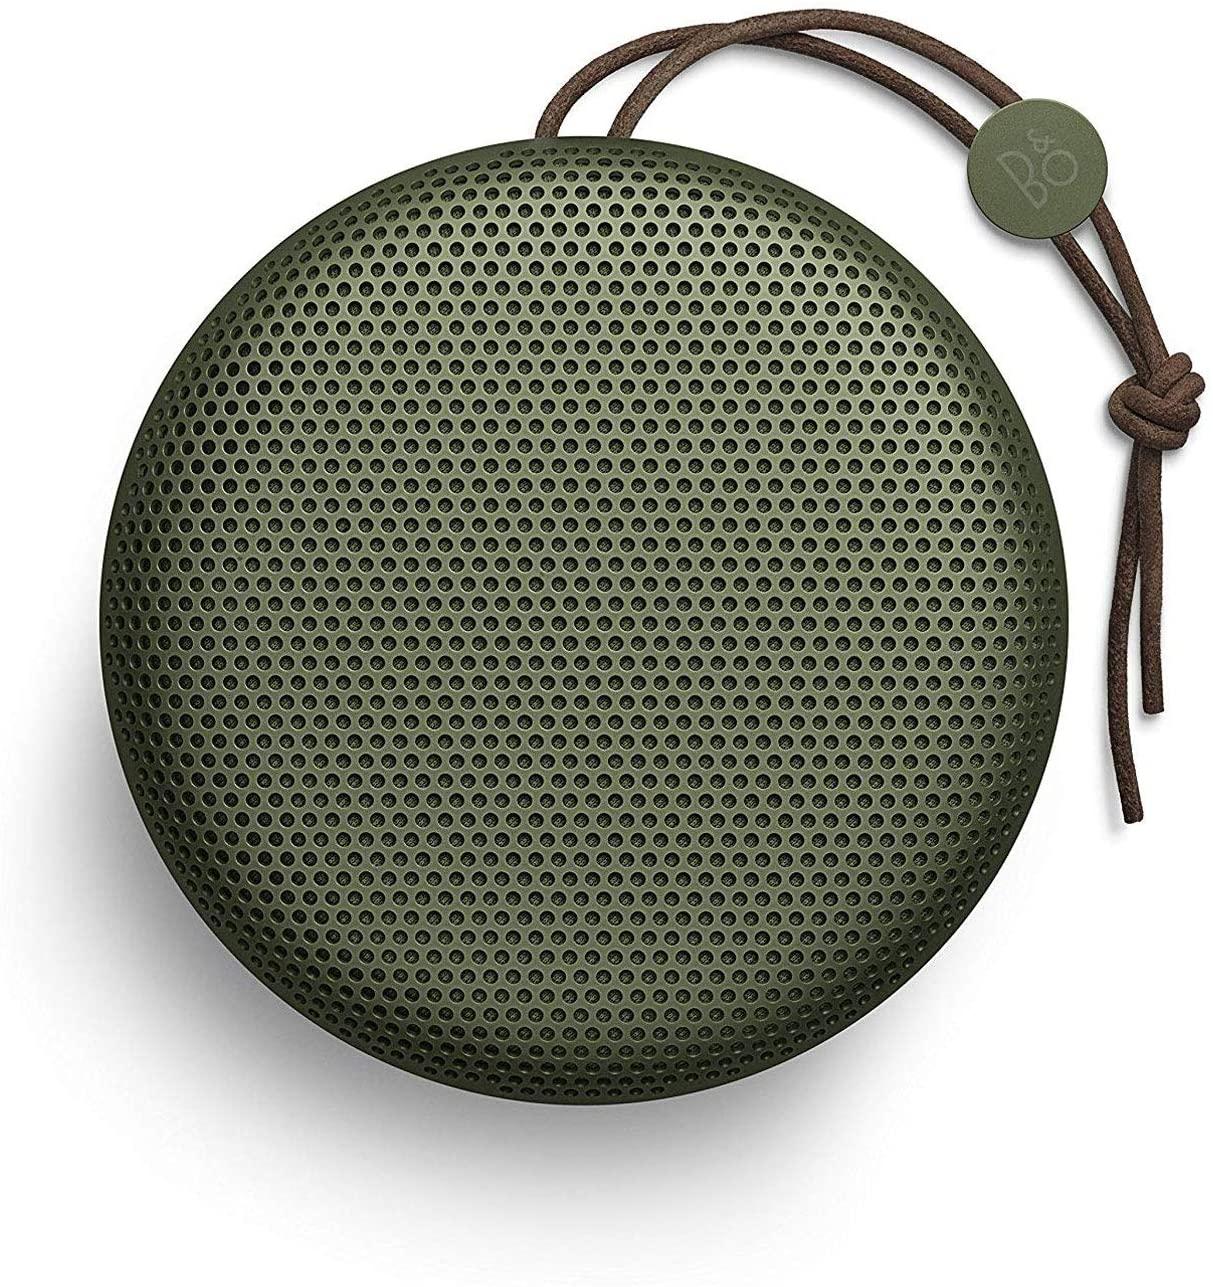 Bang & Olufsen BeoPlay A1- Altavoz Bluetooth Portátil con Micrófono, Musgo Verde